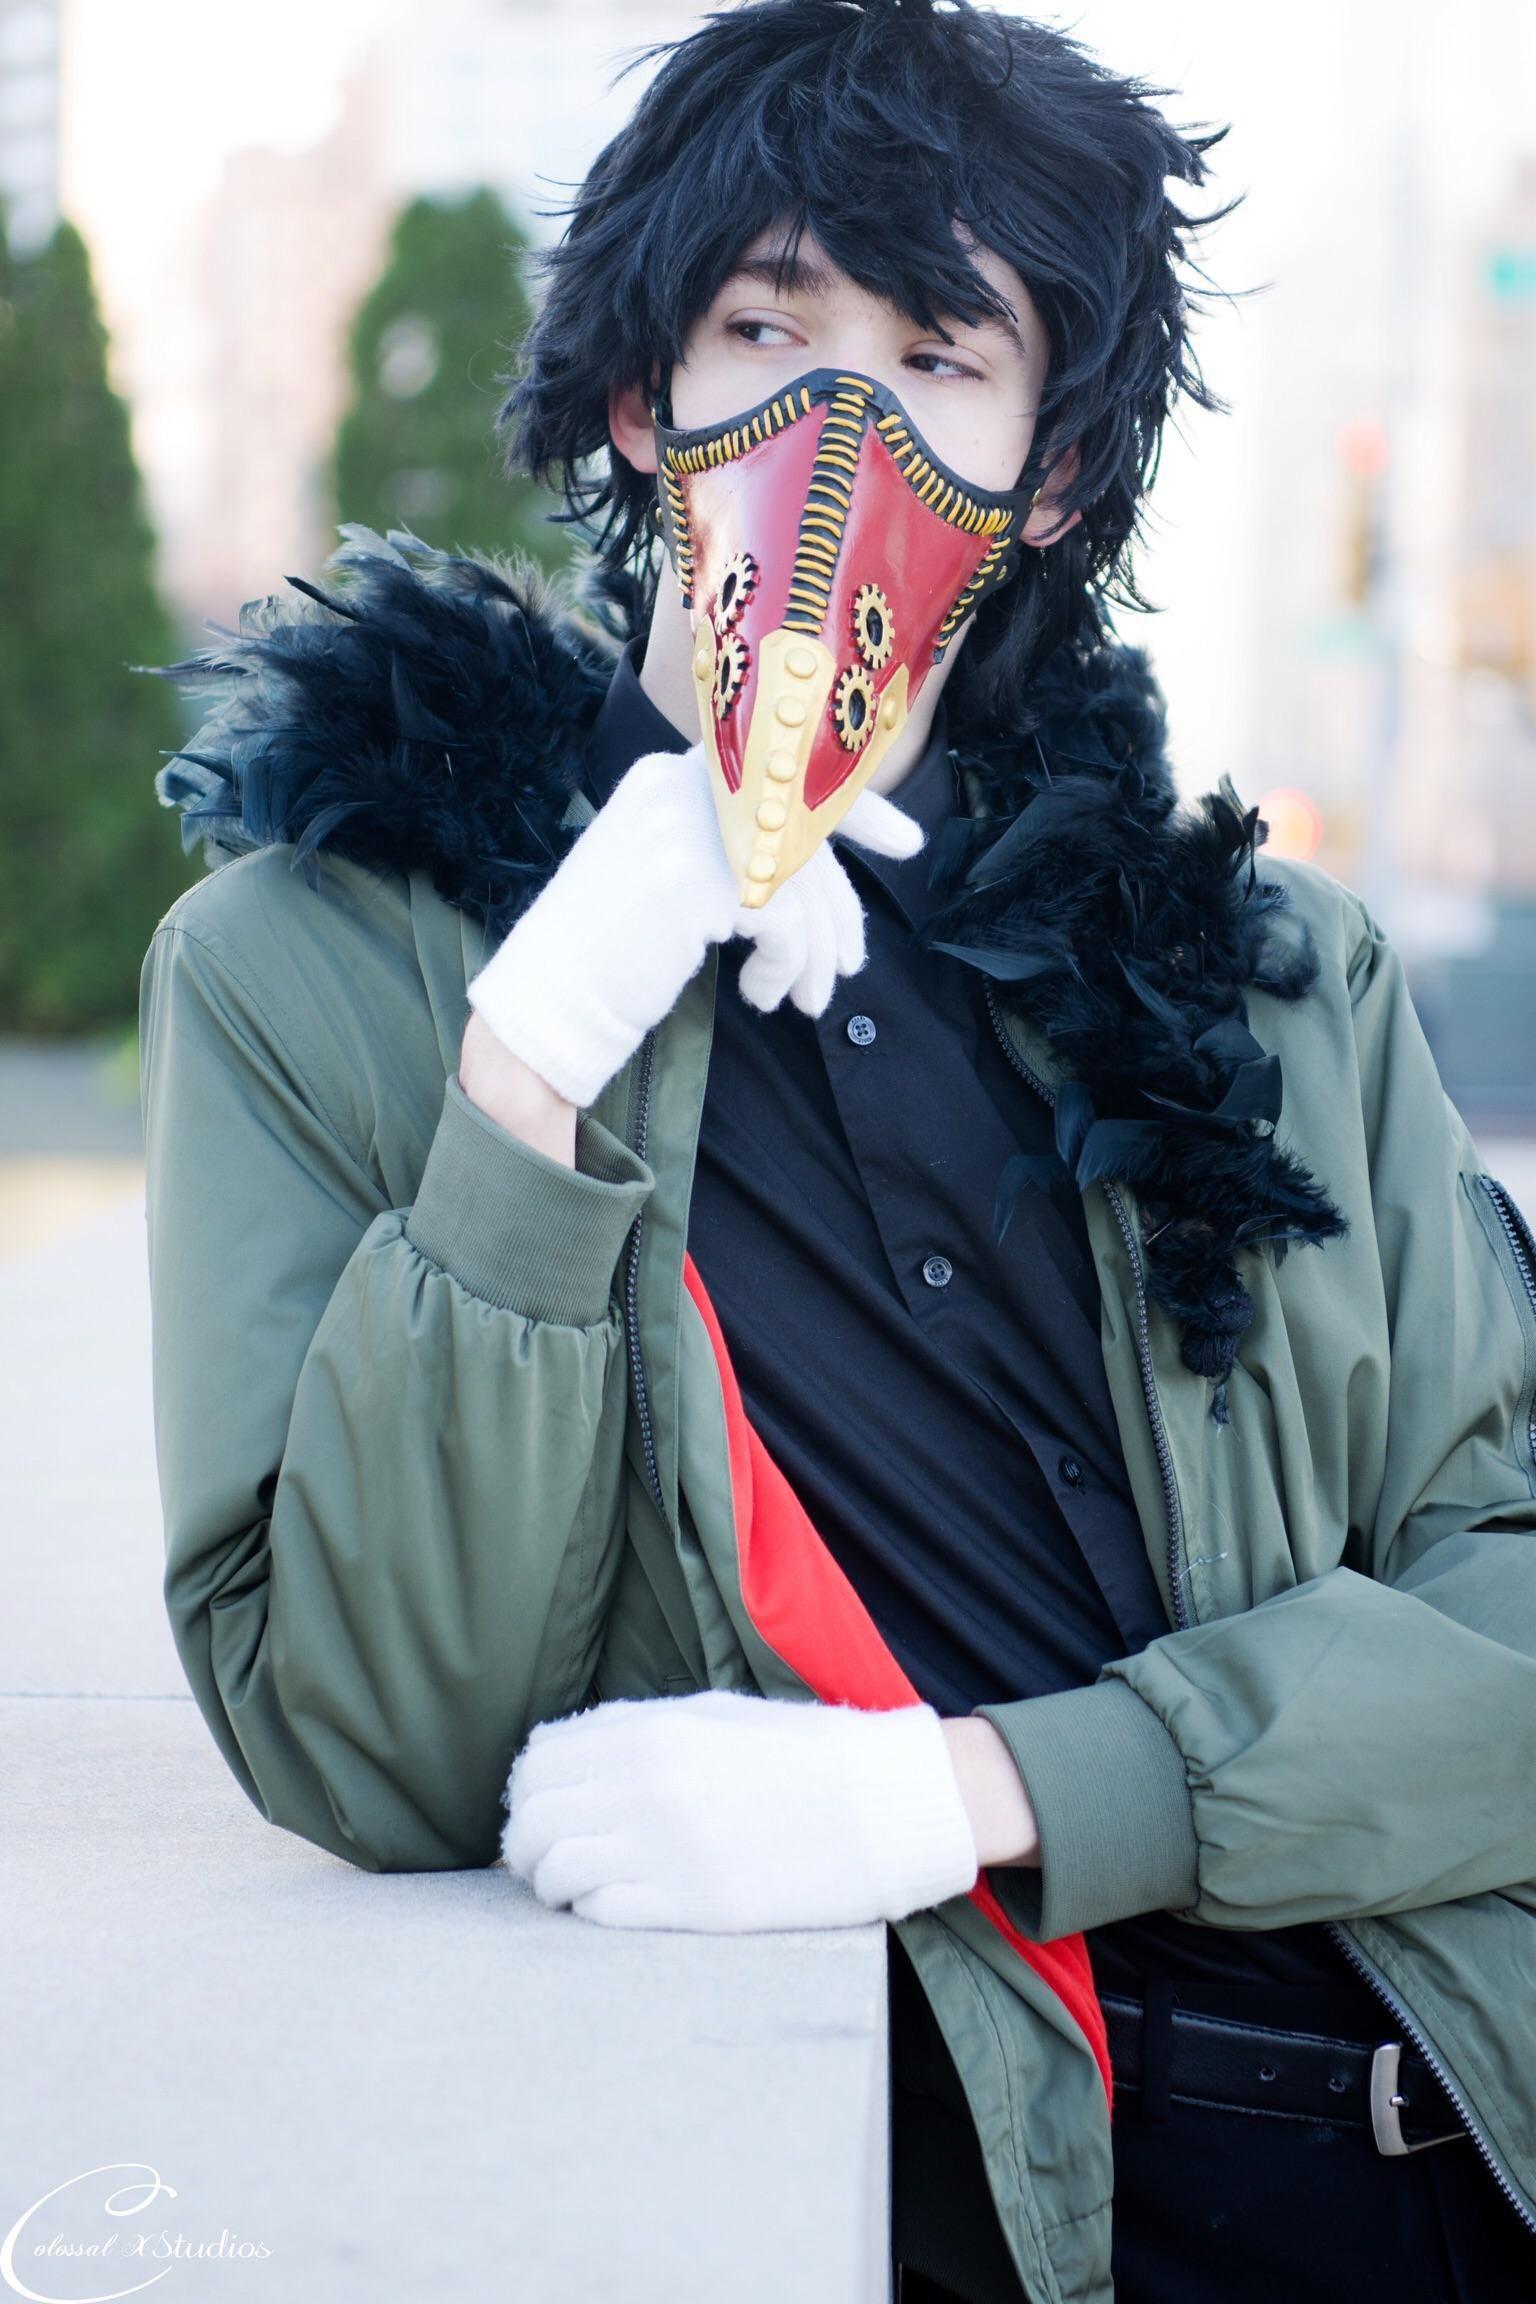 [Self] Overhaul from My Hero Academia at AnimeNYC My